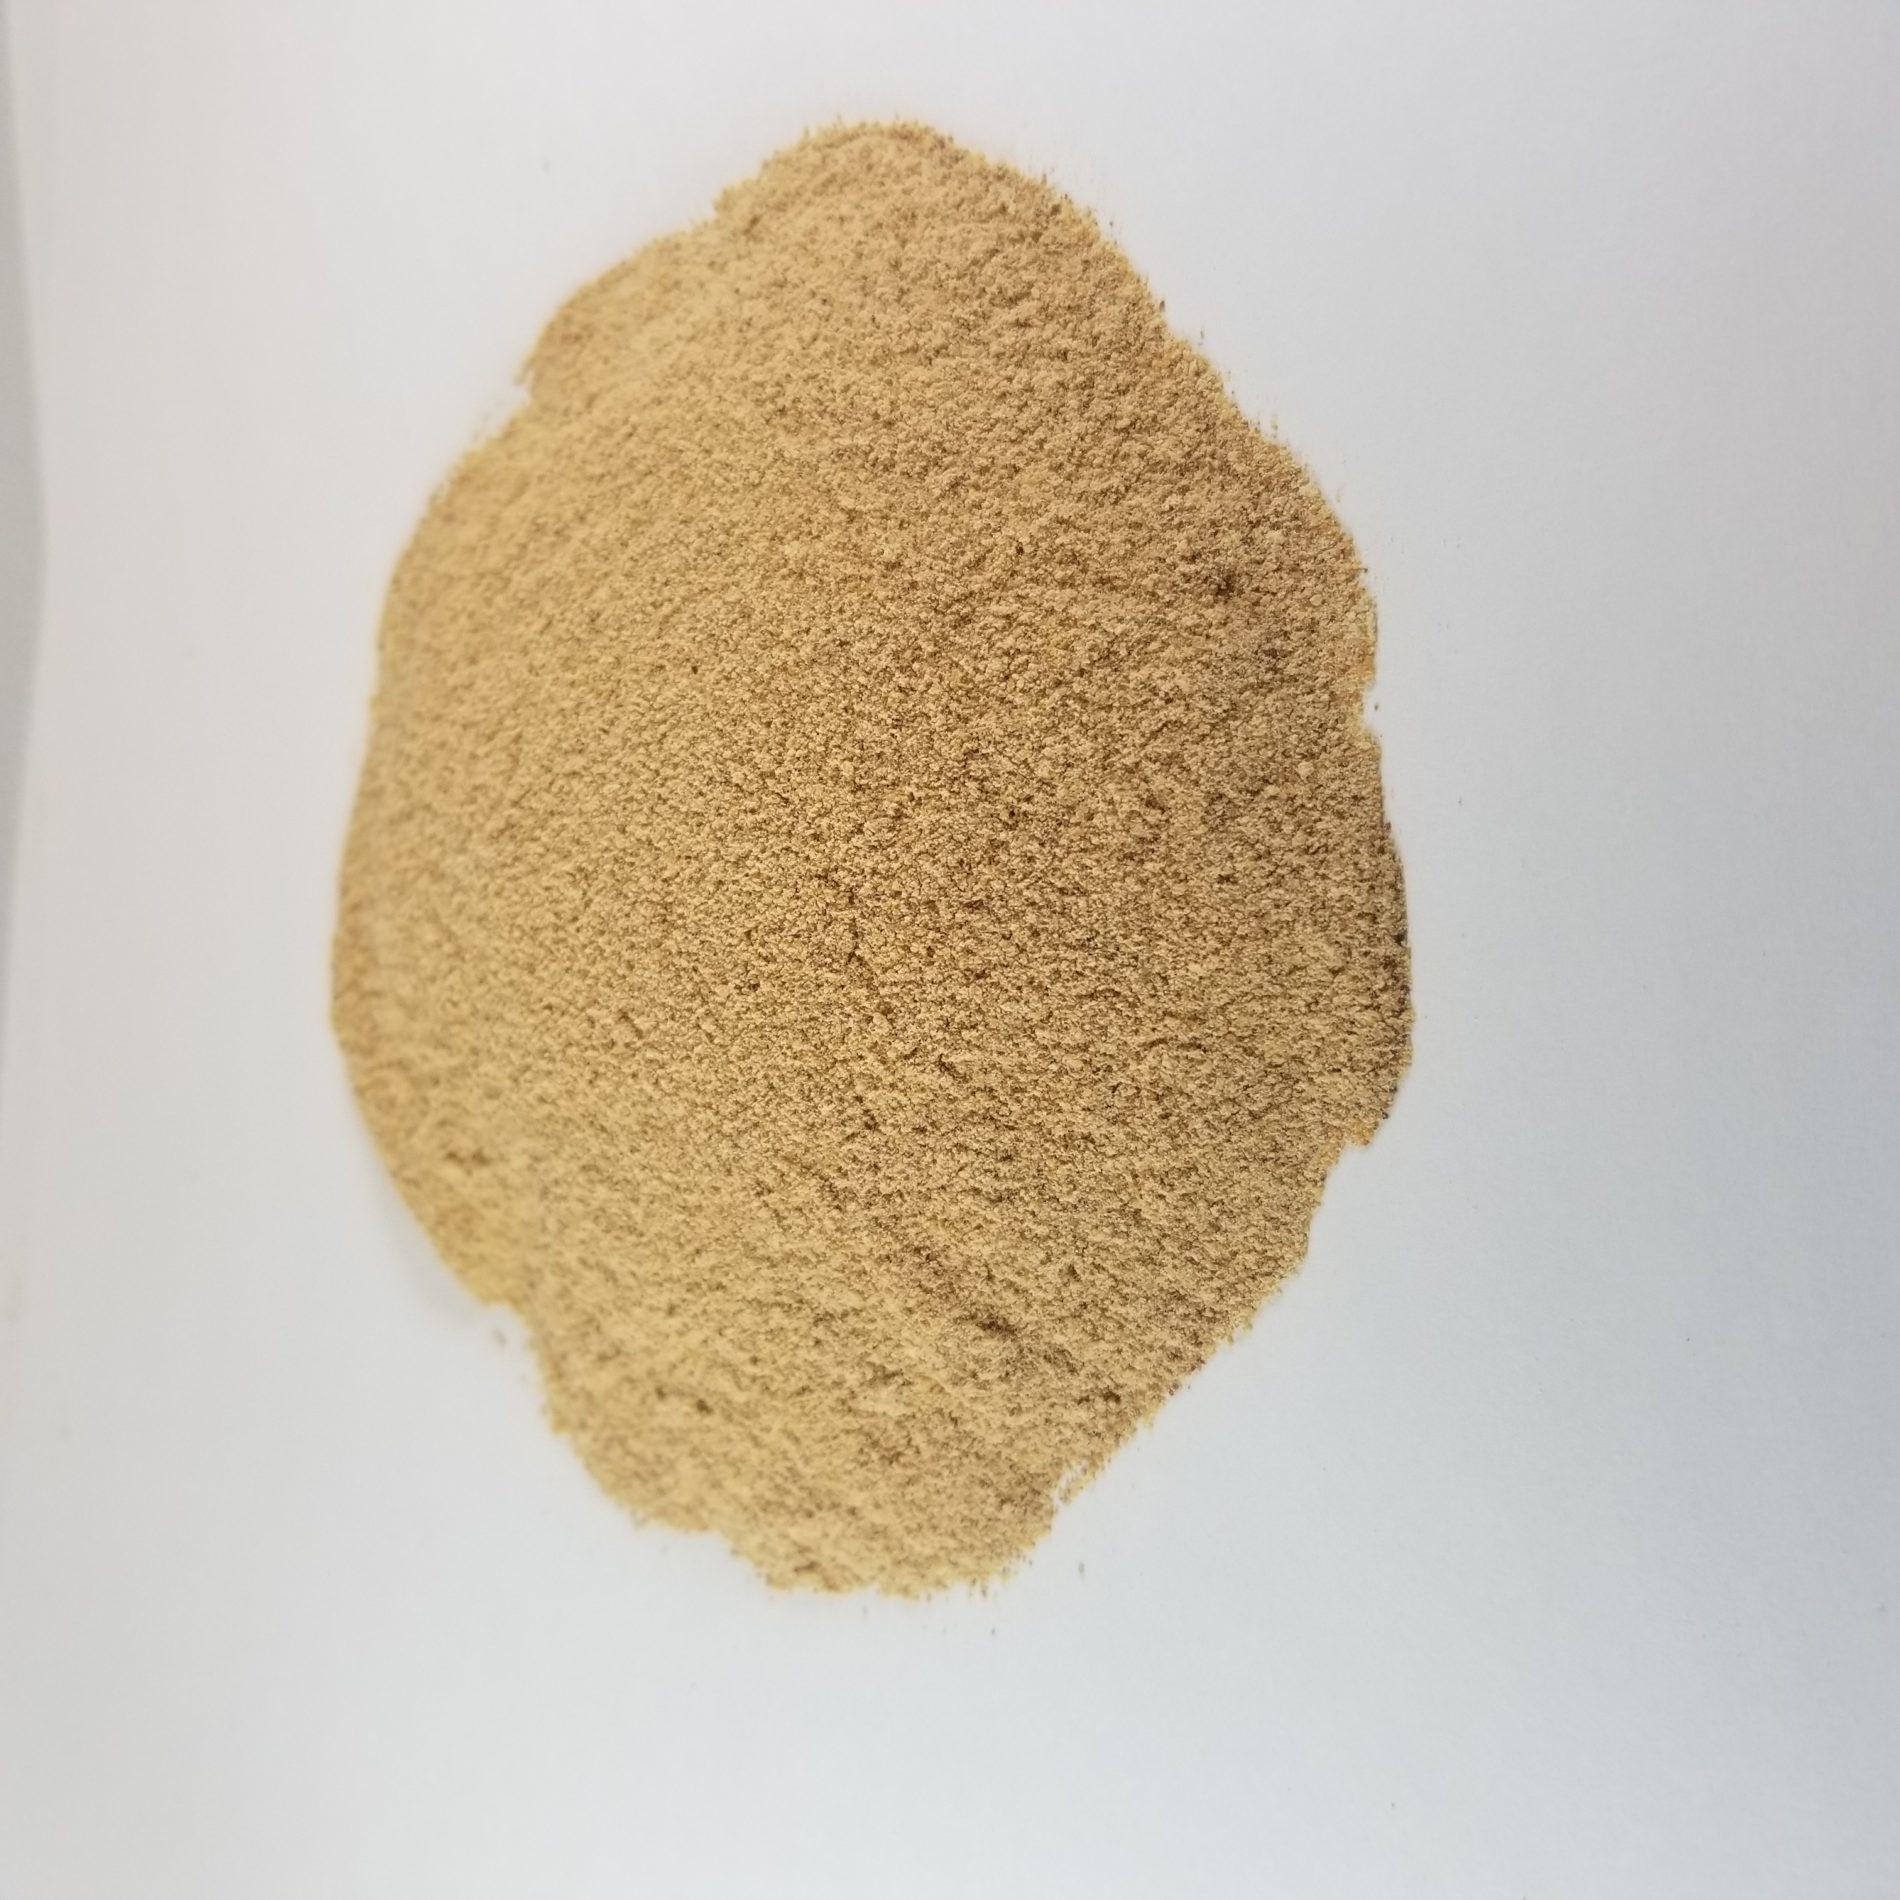 Pinto Bean Powder with Salt, 50LB Bag